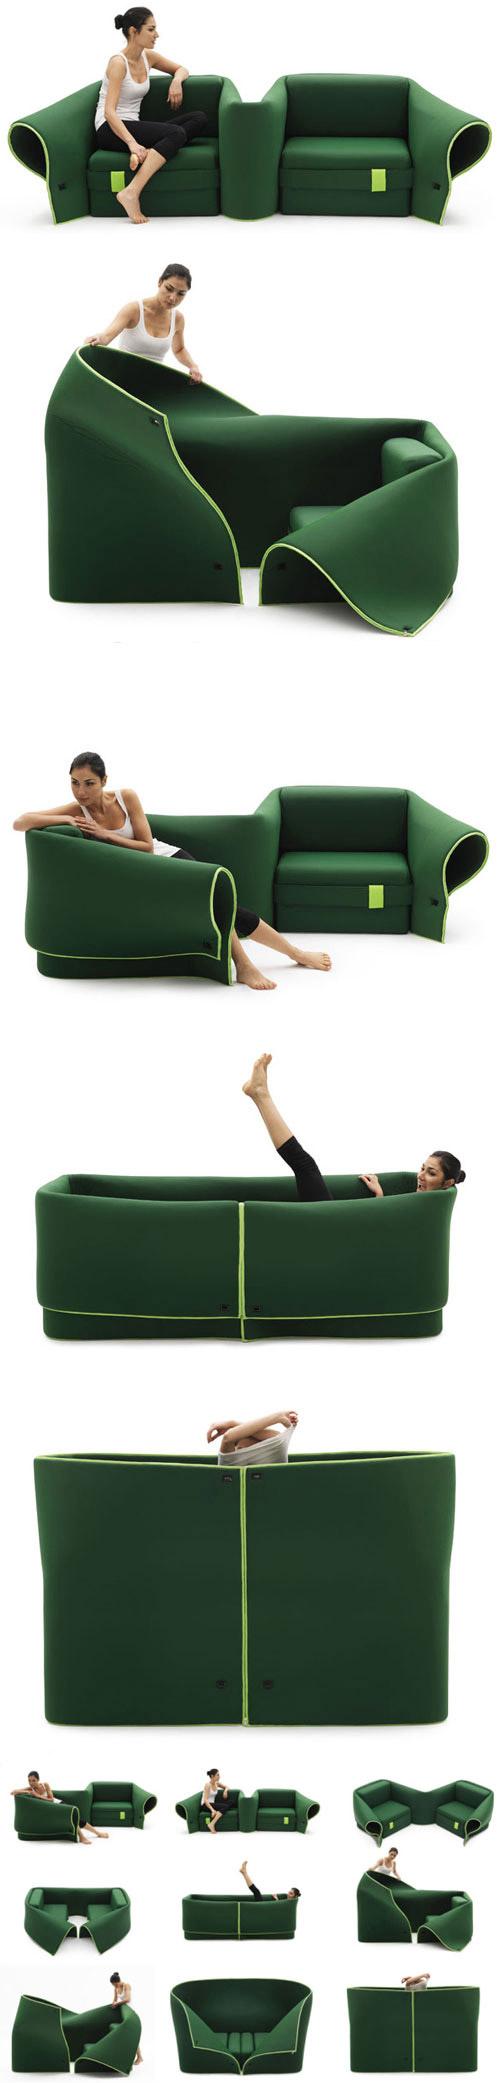 Awesome convertible sofa.